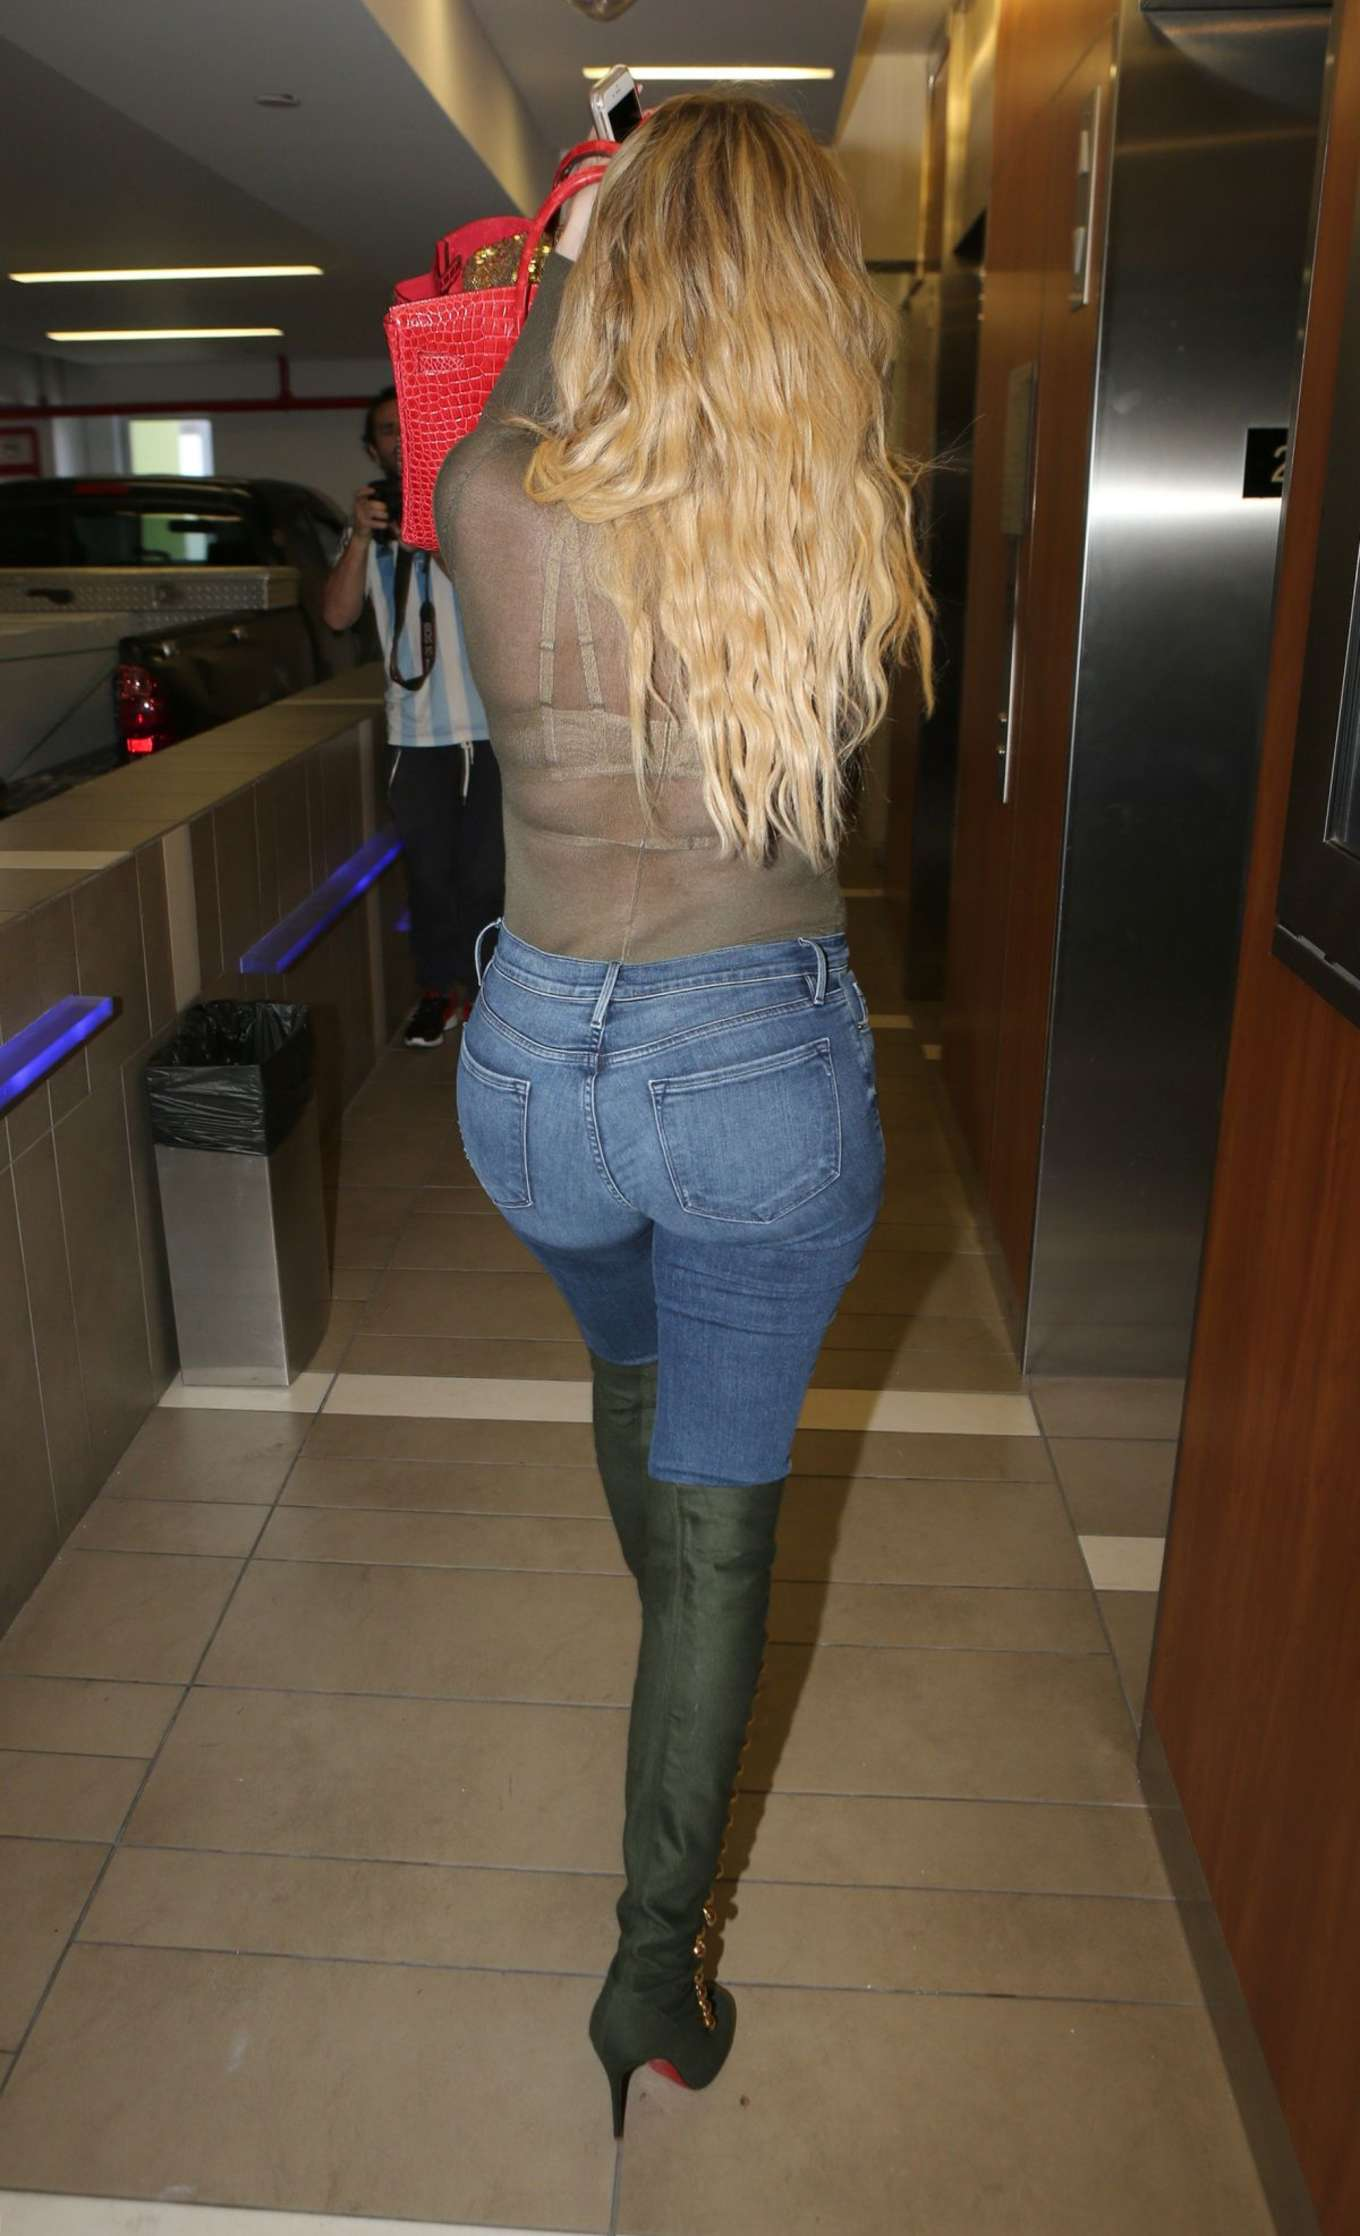 Khloe Kardashian Booty In Jeans 10 Gotceleb